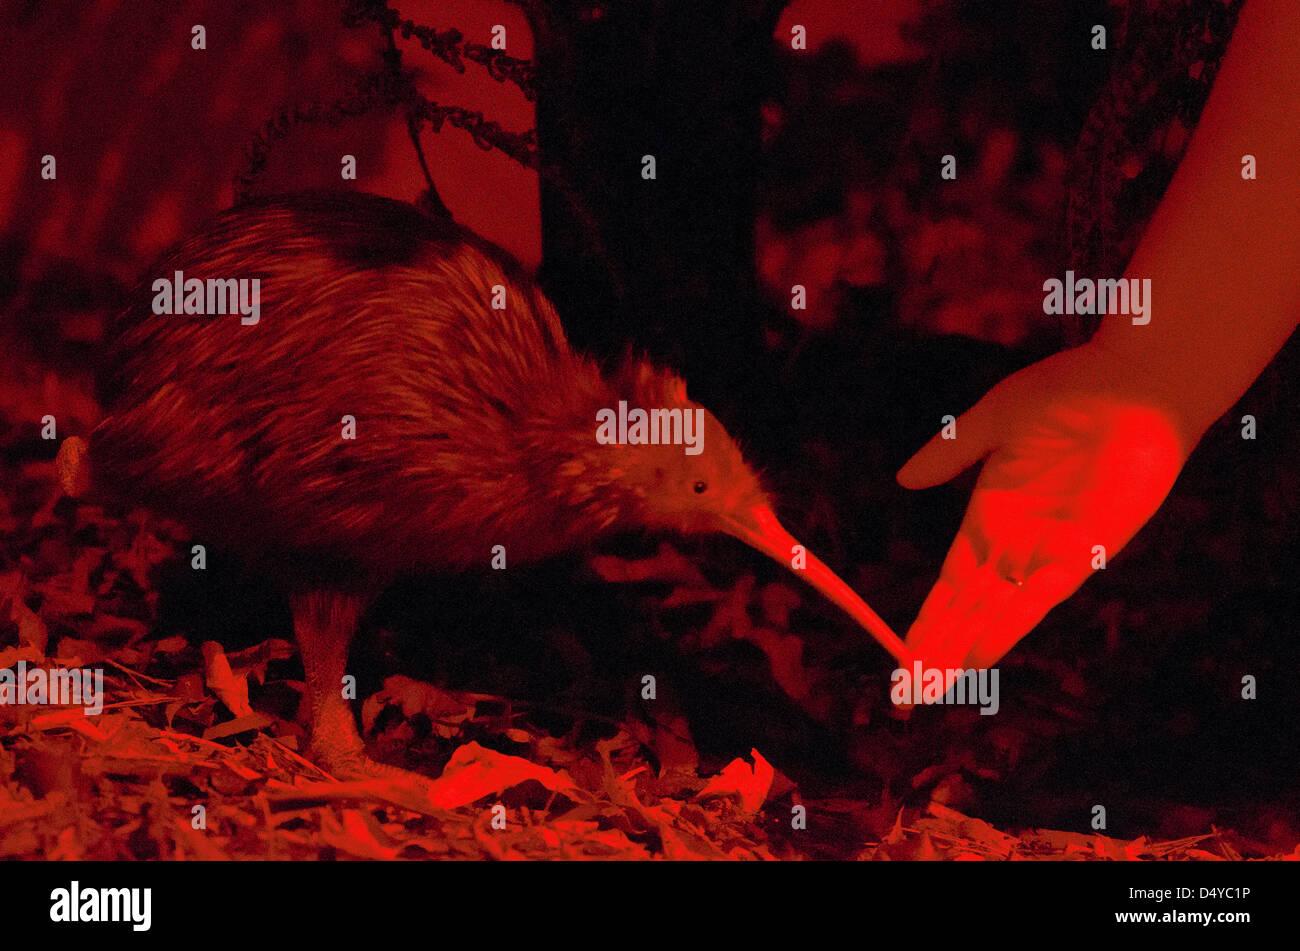 Human hand feeds a Kiwi. - Stock Image